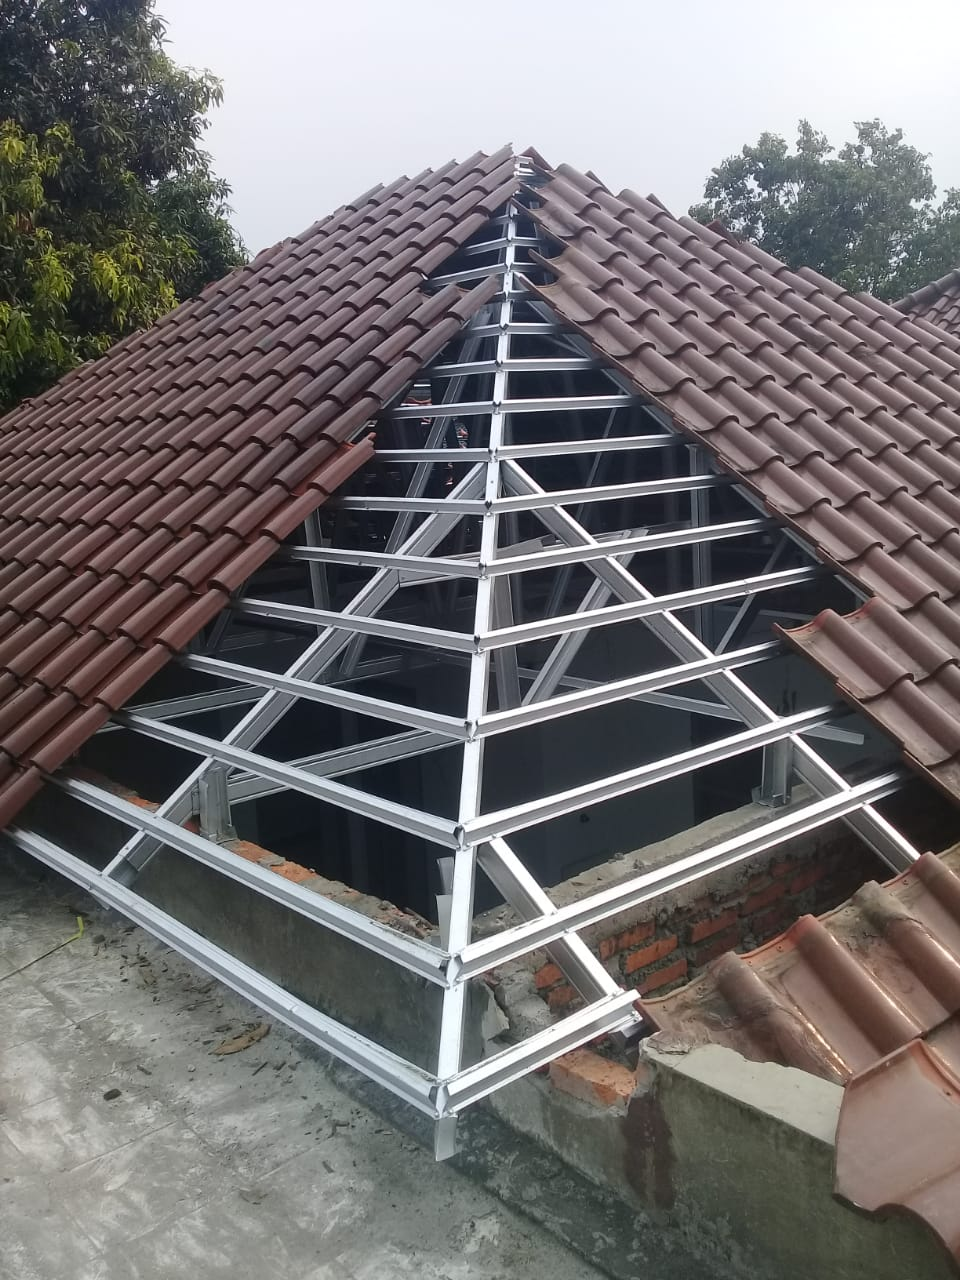 kanopi baja ringan bekas biaya tak terduga bongkar pasang atap menjadi jayawan